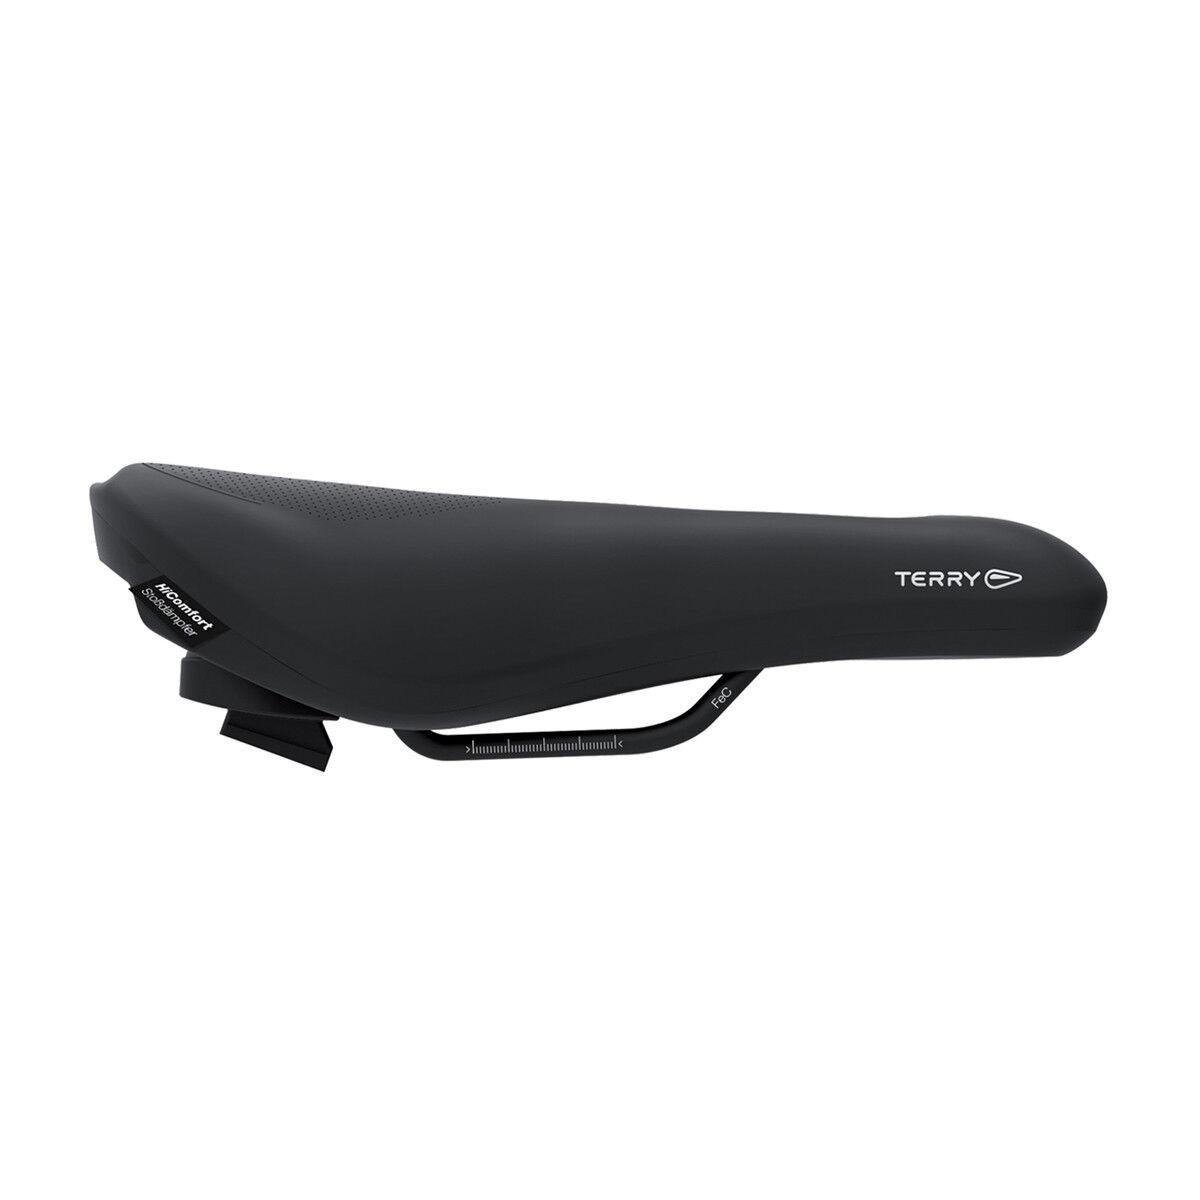 Terry Fisio Flex Gel Sie Comfort Herren Trekking Fahrrad Sattel schwarz